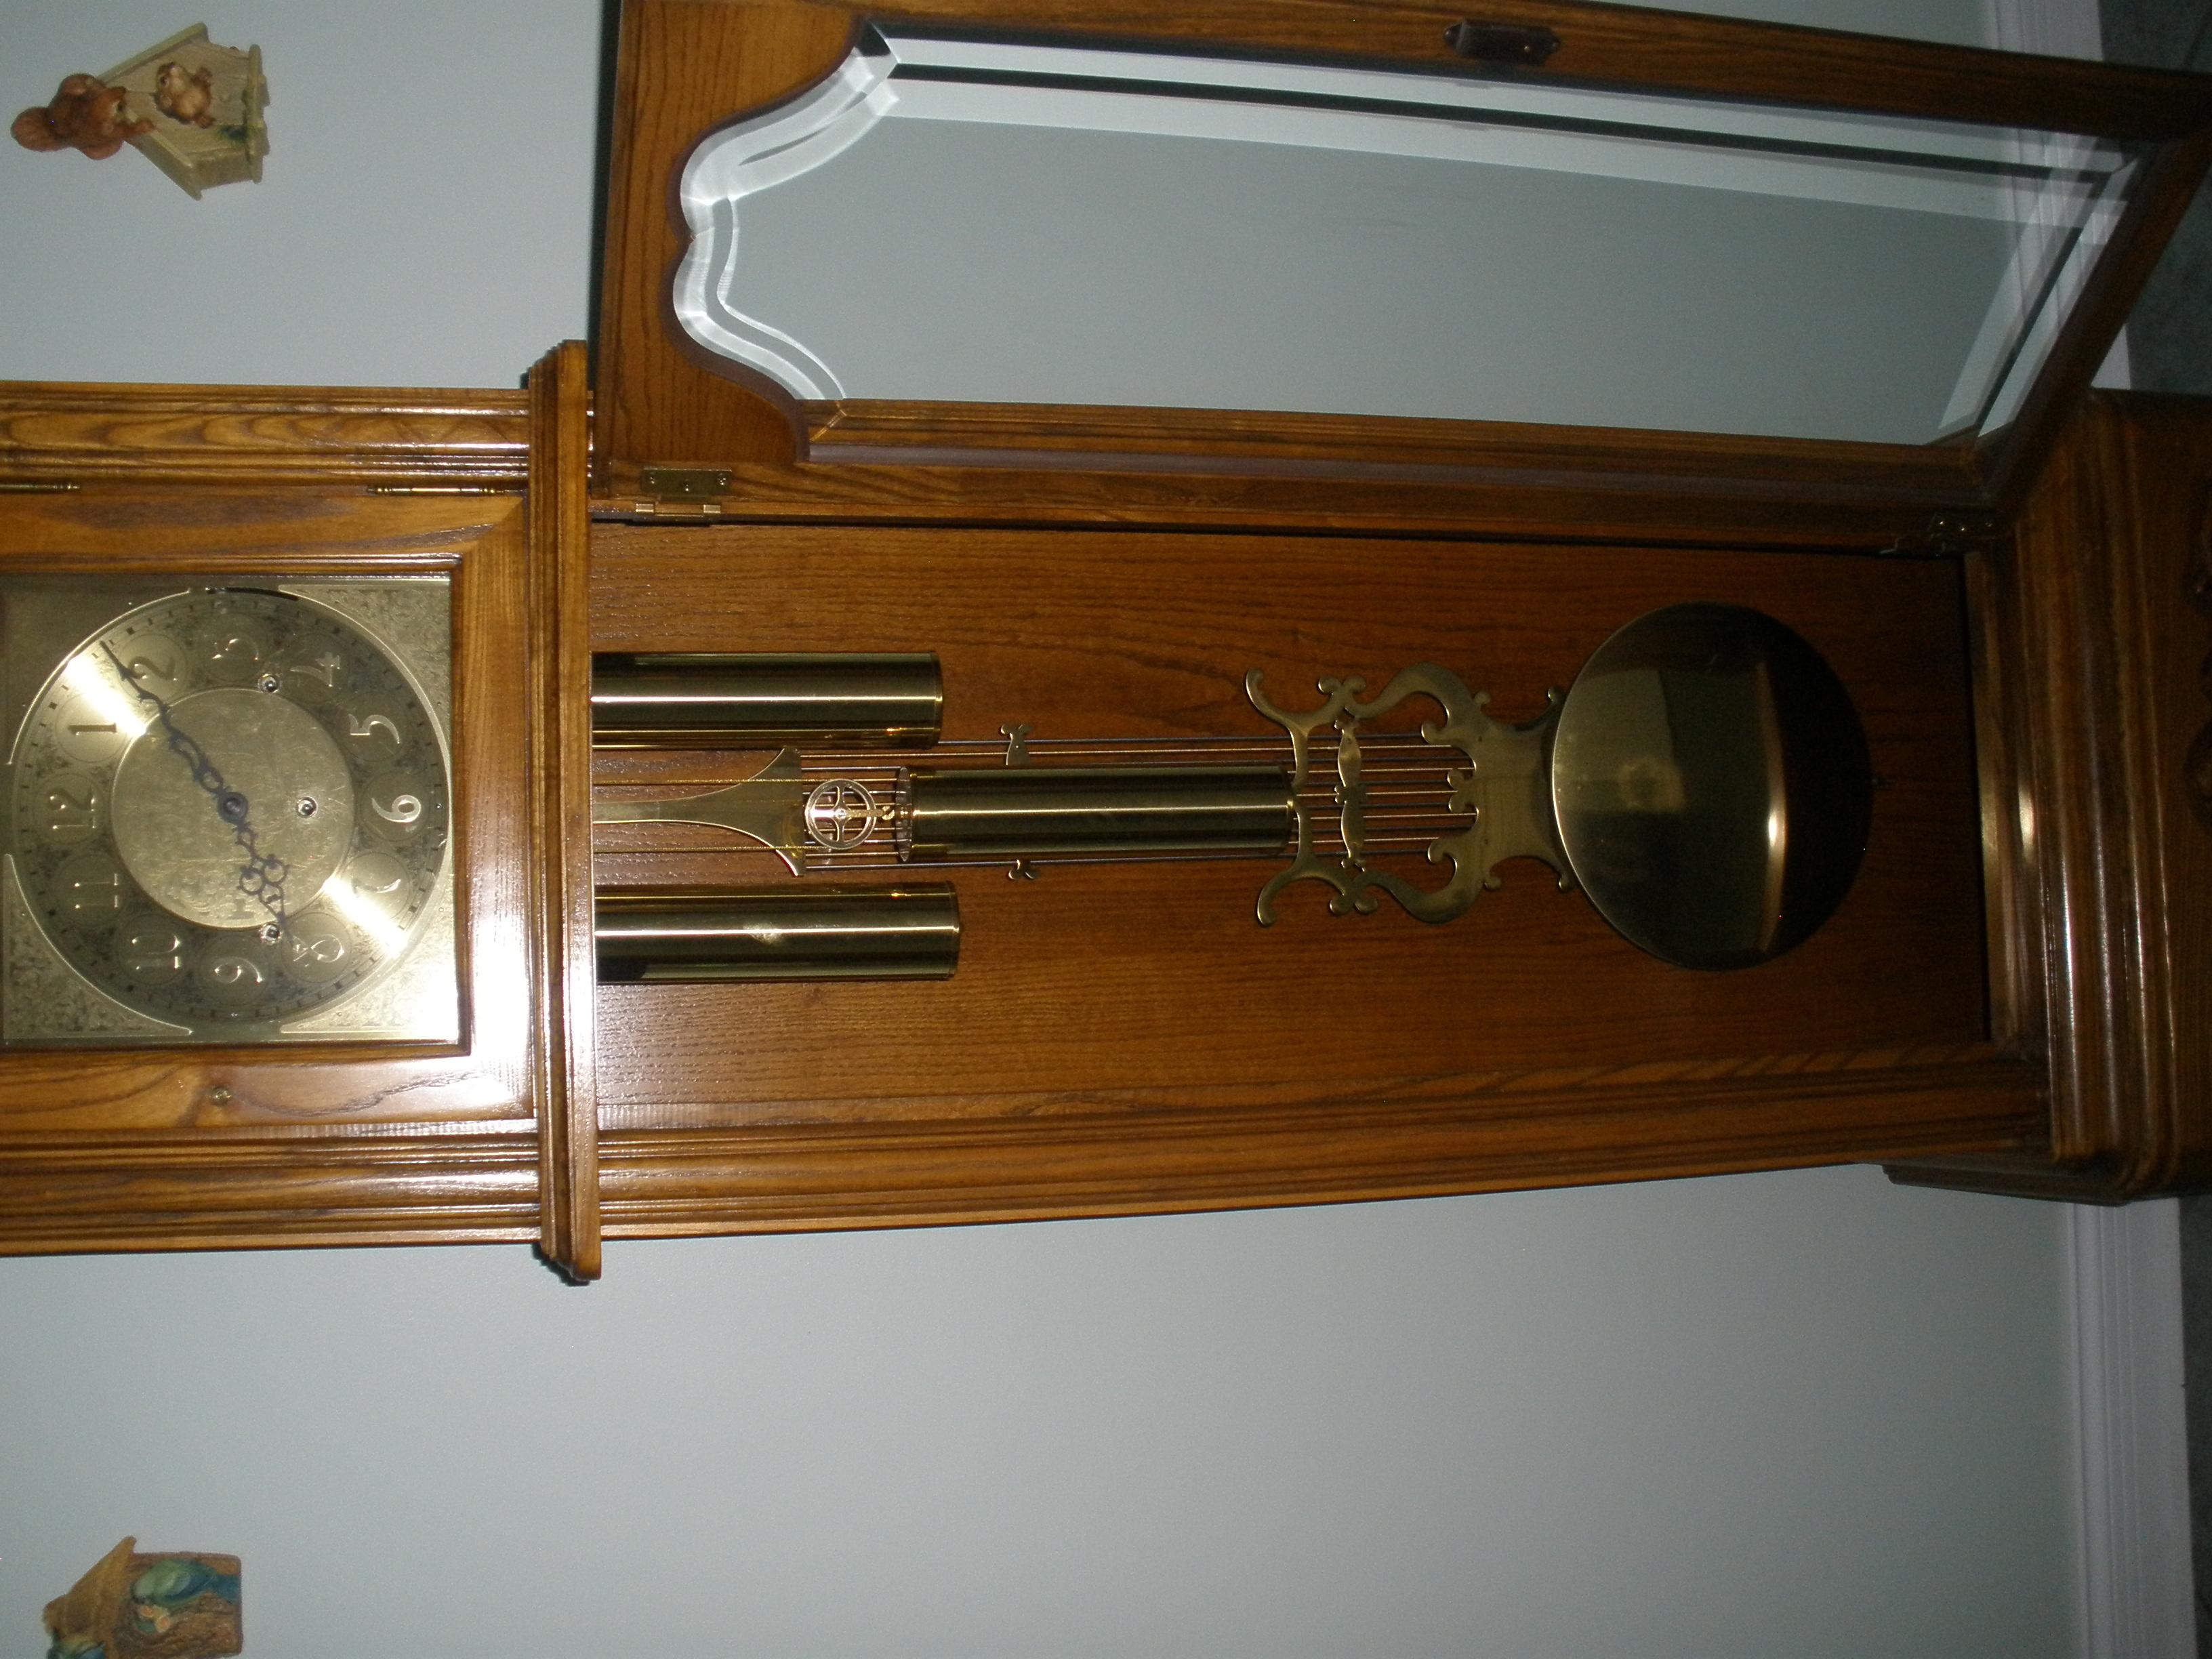 I Have A Limited Edition Kelohna Clock Salem Clock Co My Grandson